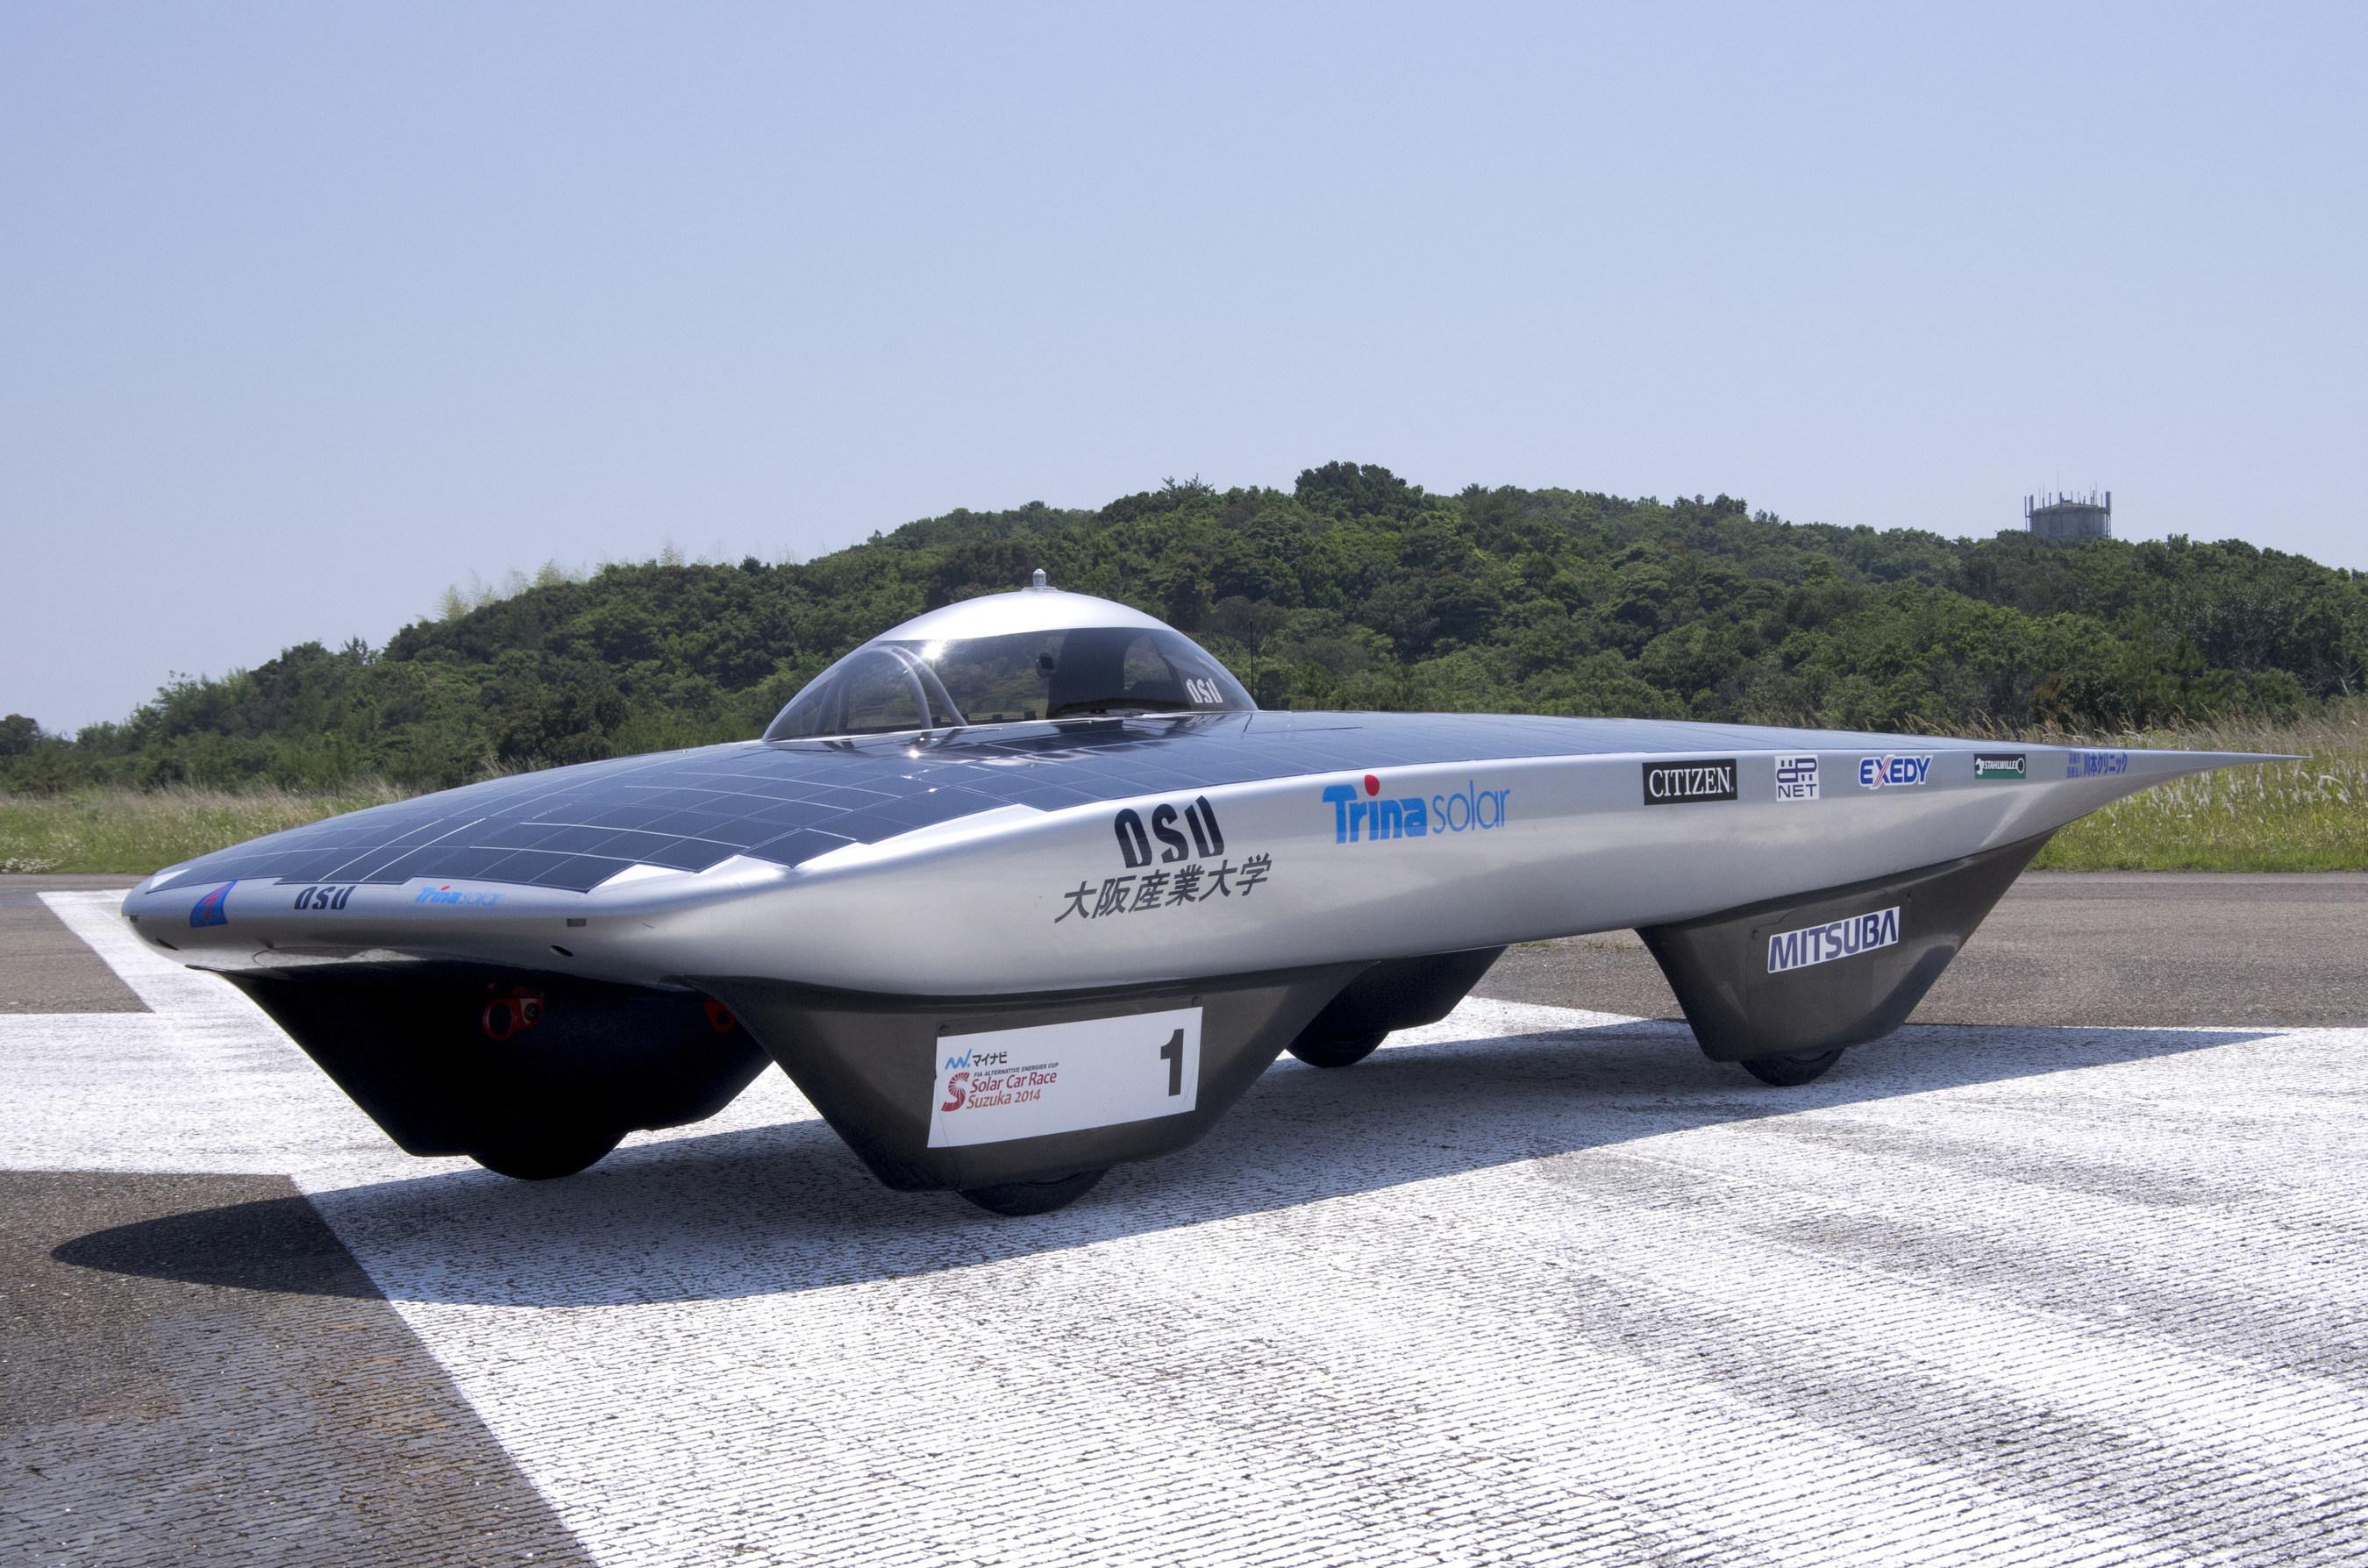 Trina Solar Provides Osaka Sangyo University with its High Efficiency IBC Cells to Build a Solar Car